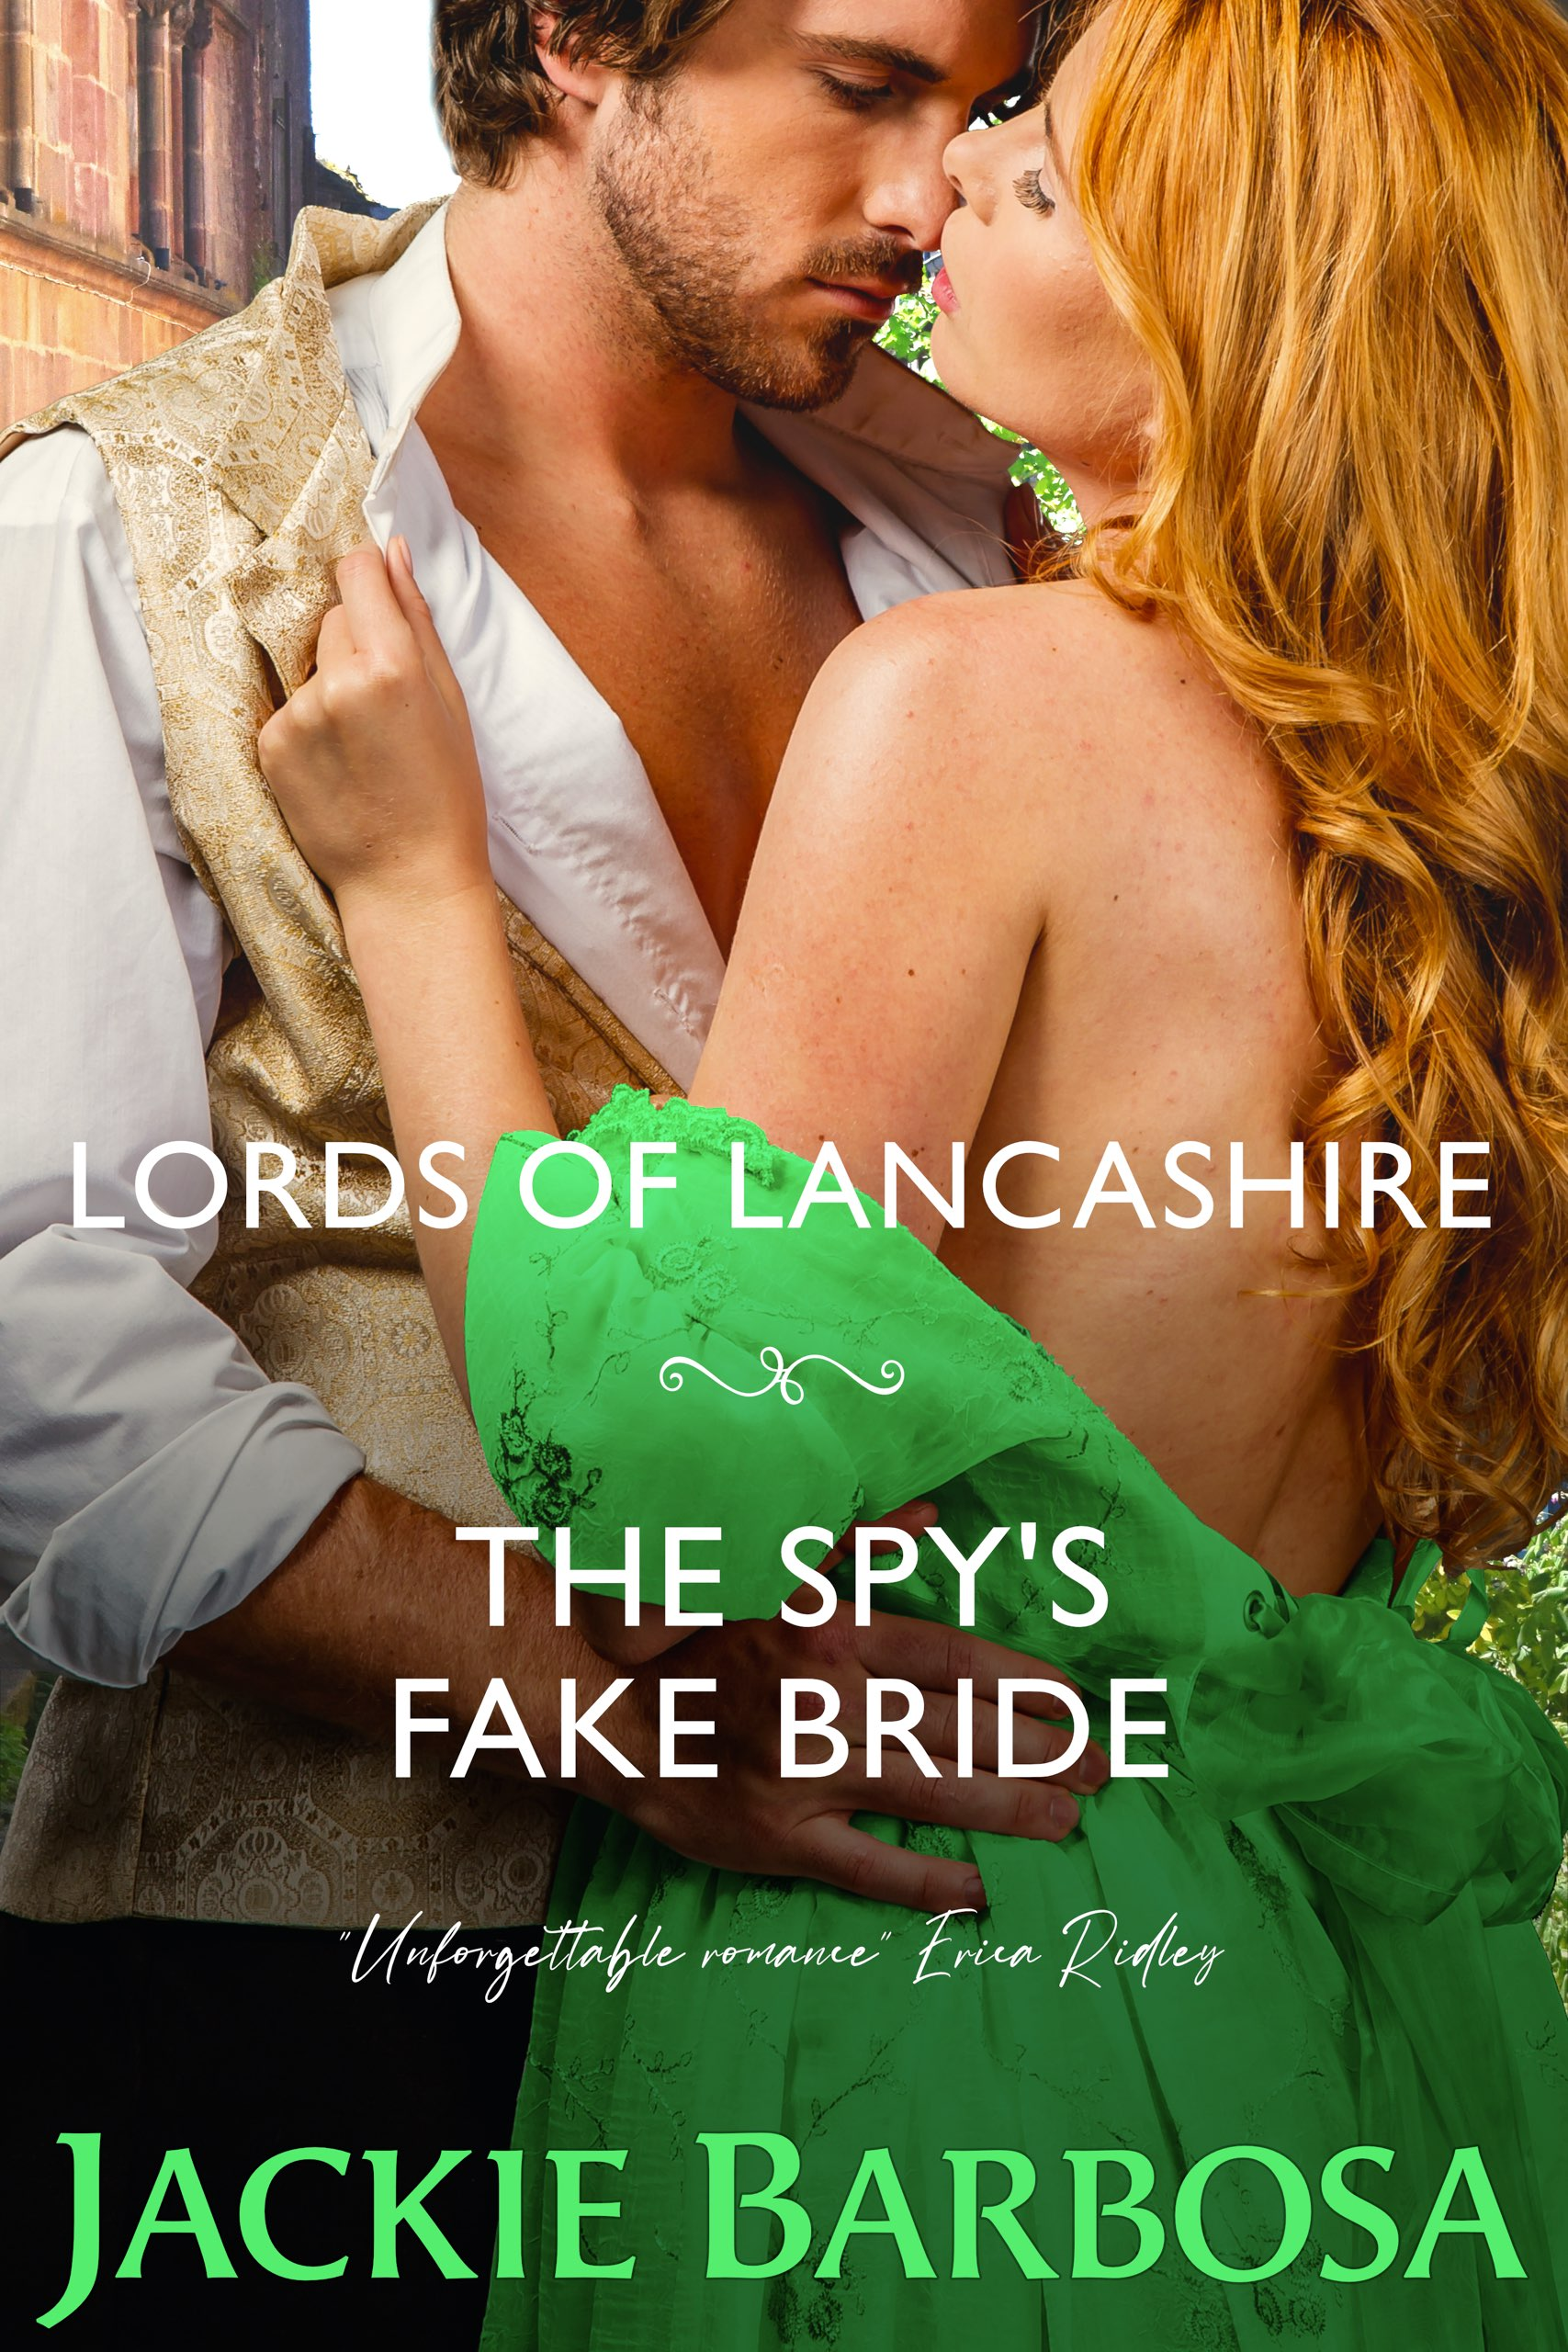 The Spy's Fake Bride by Jackie Barbosa